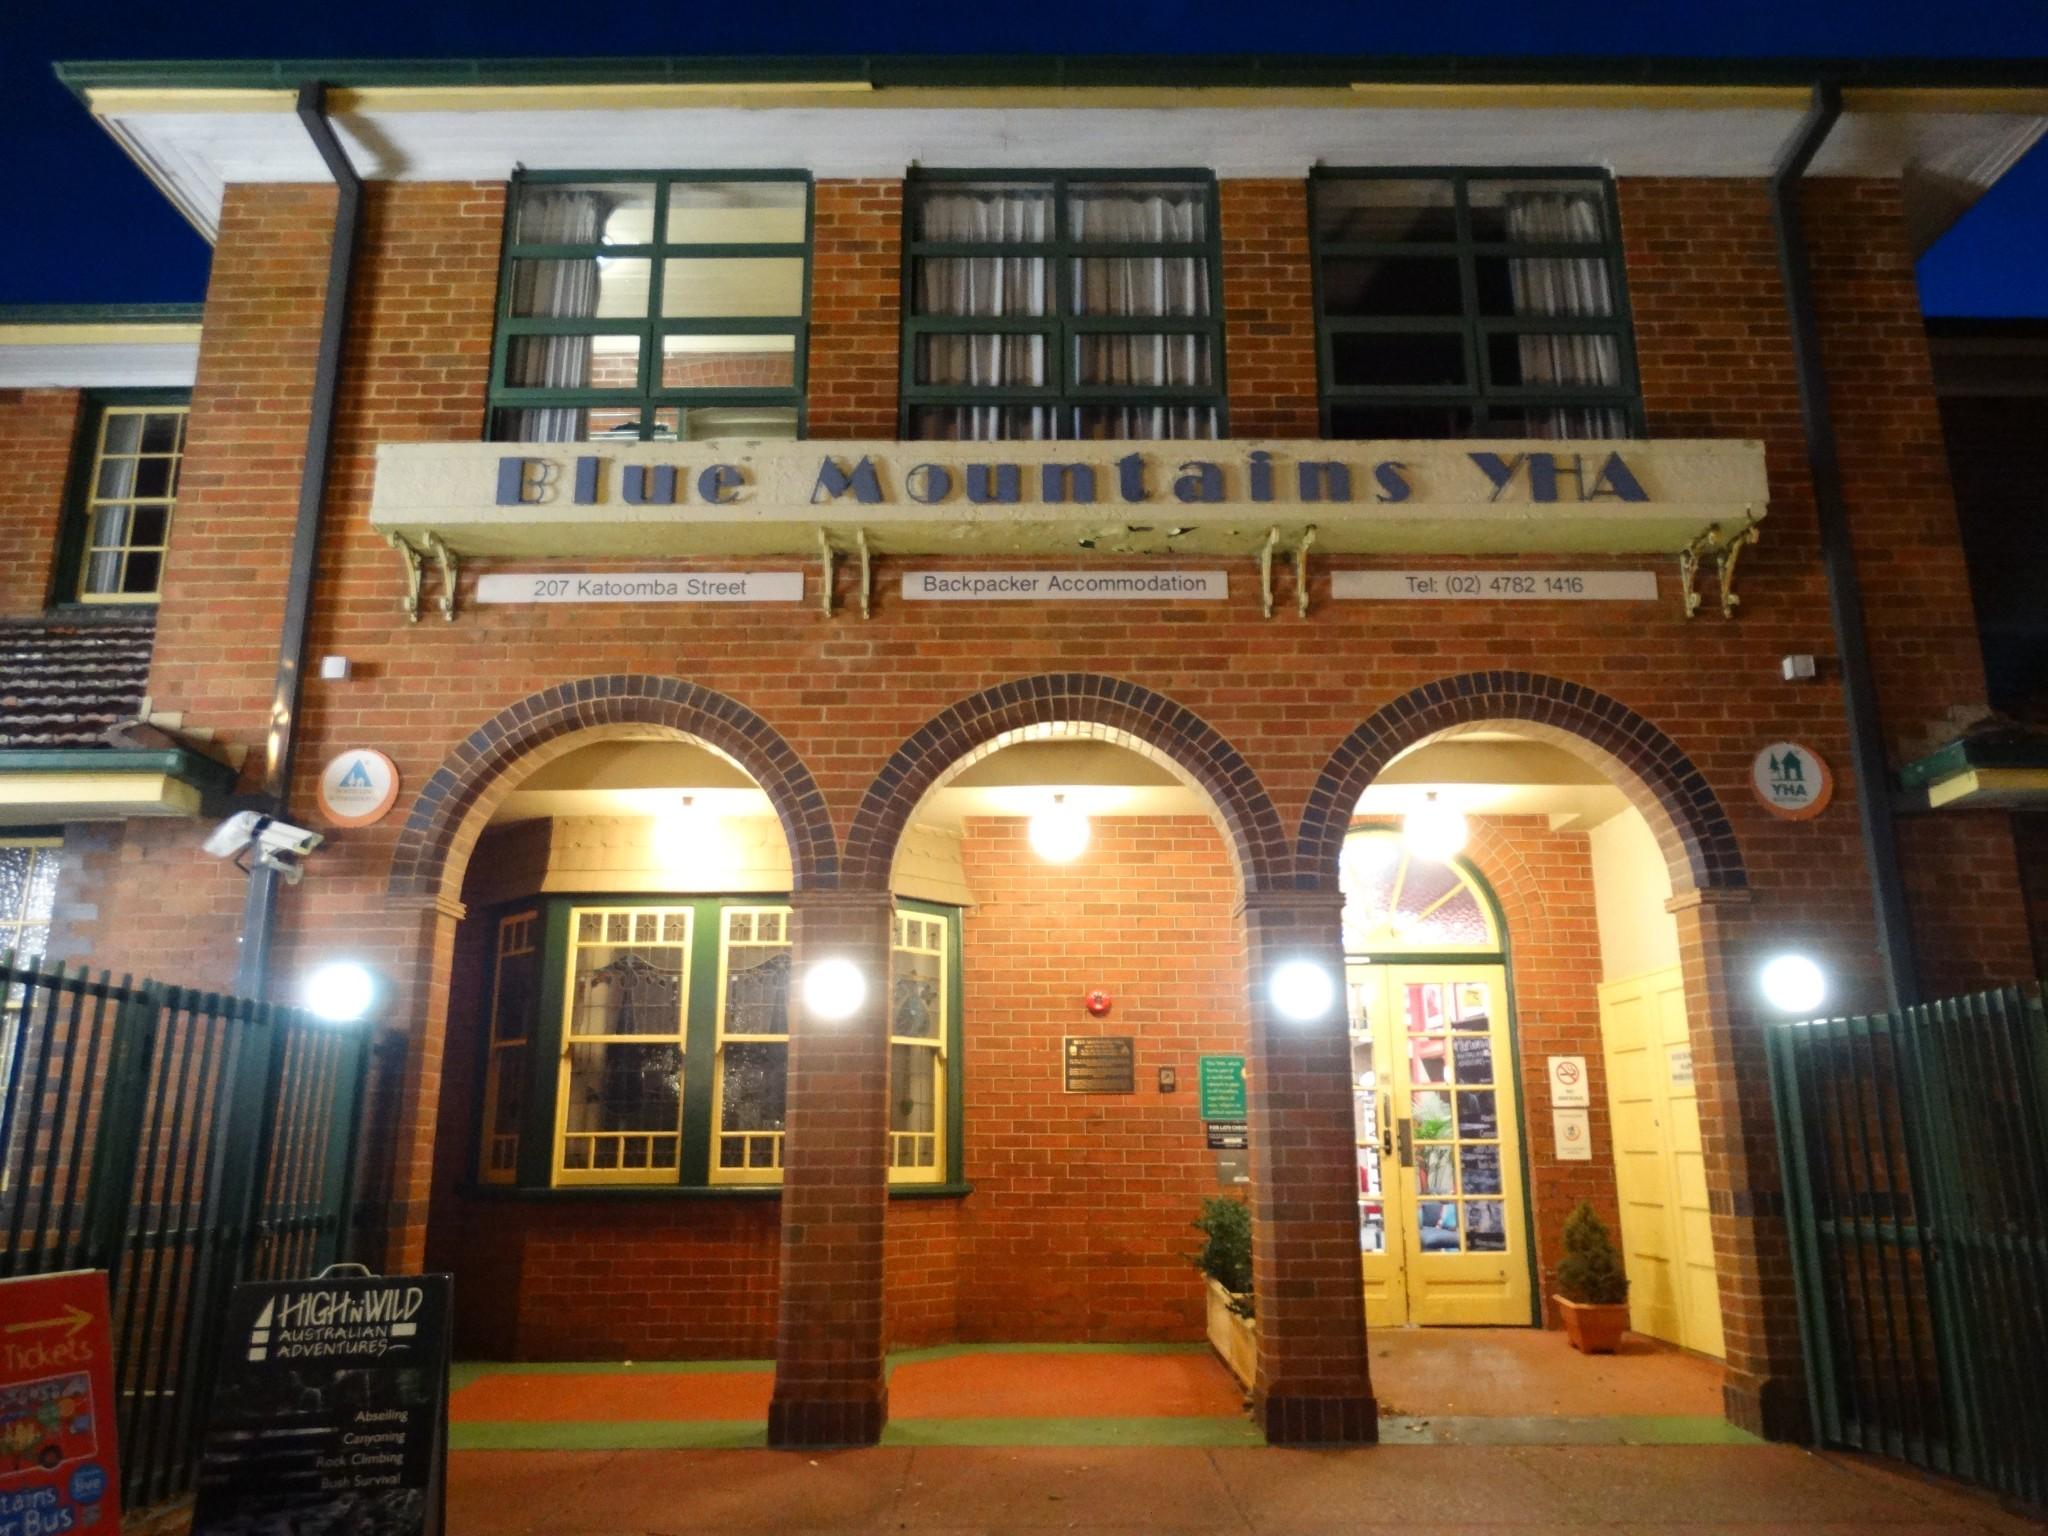 Blue Mountains YHA, Katoomba.